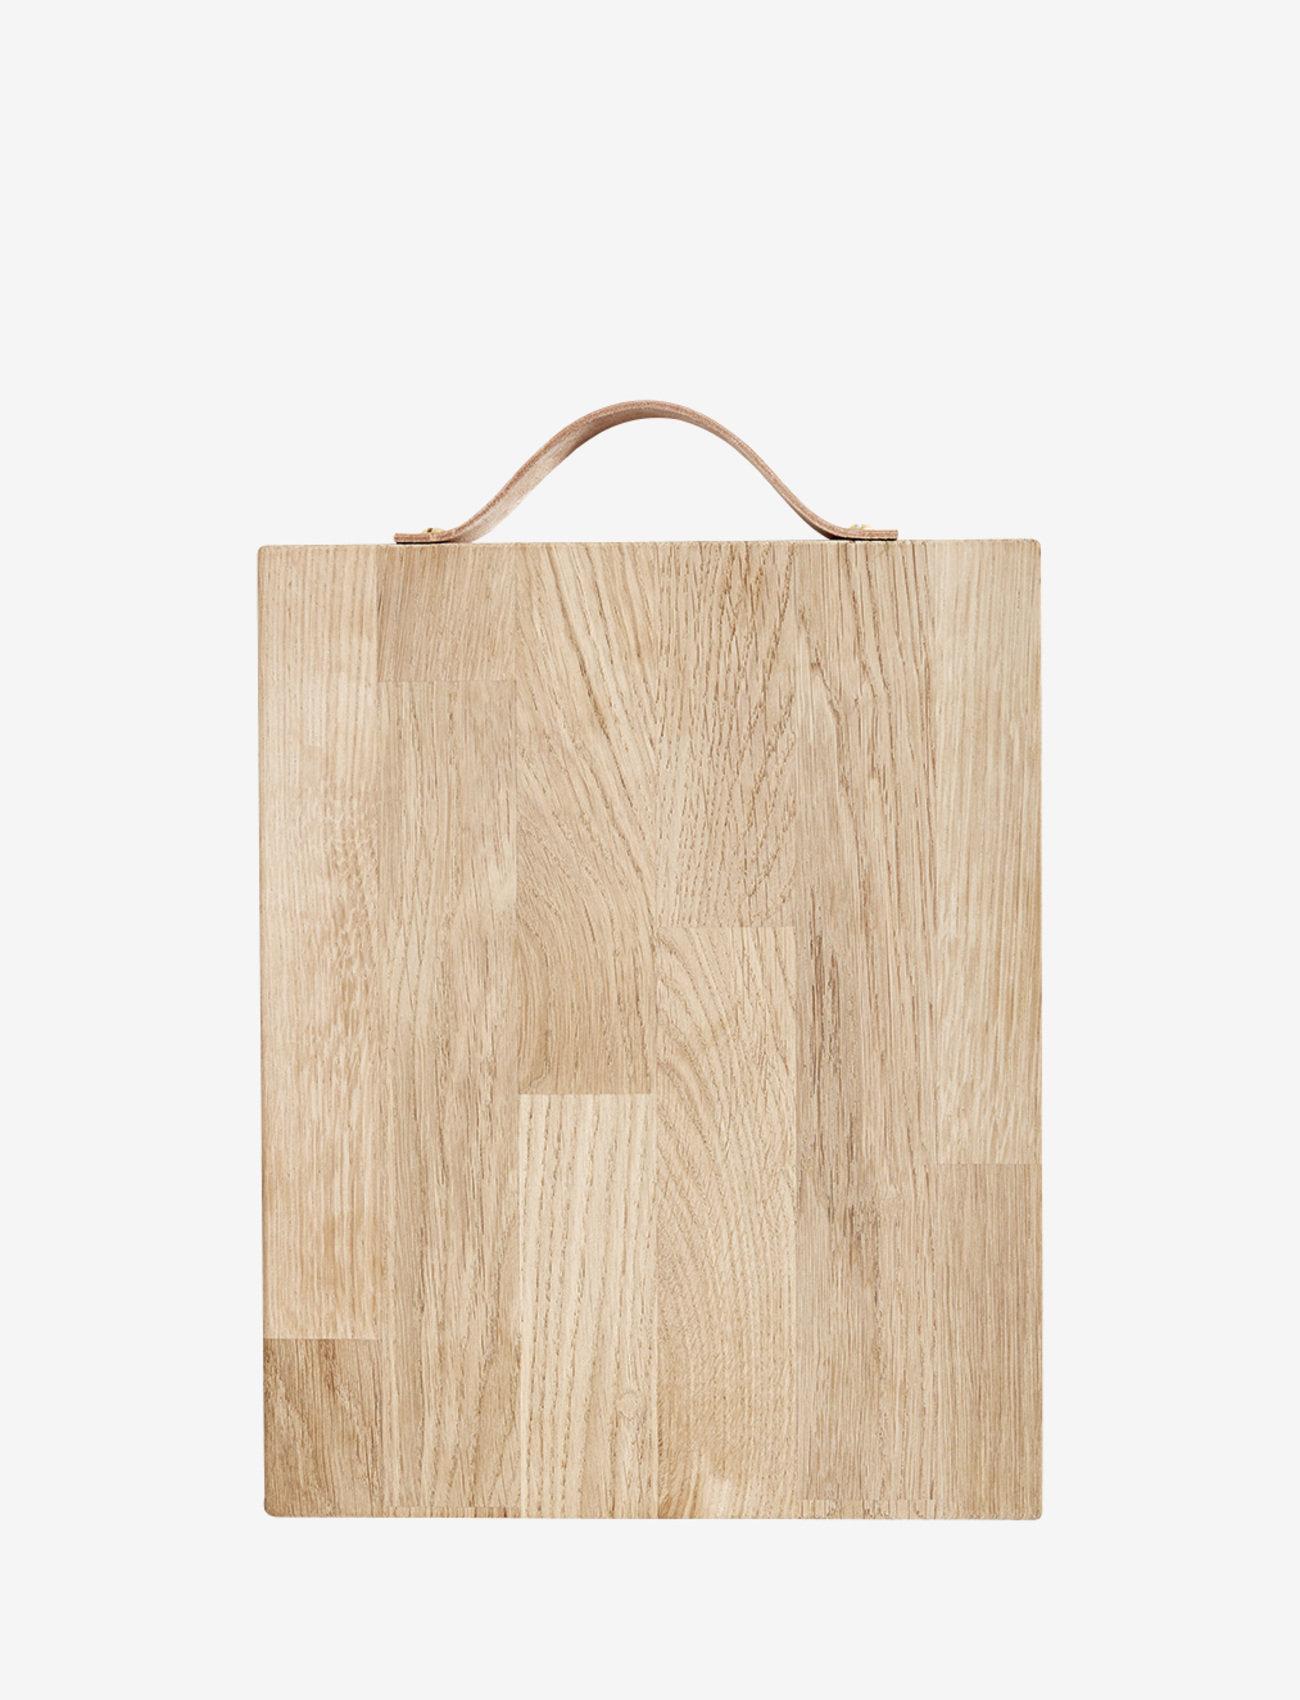 Andersen Furniture - Servingboard w. leather handle - skjærebrett - no color - 0